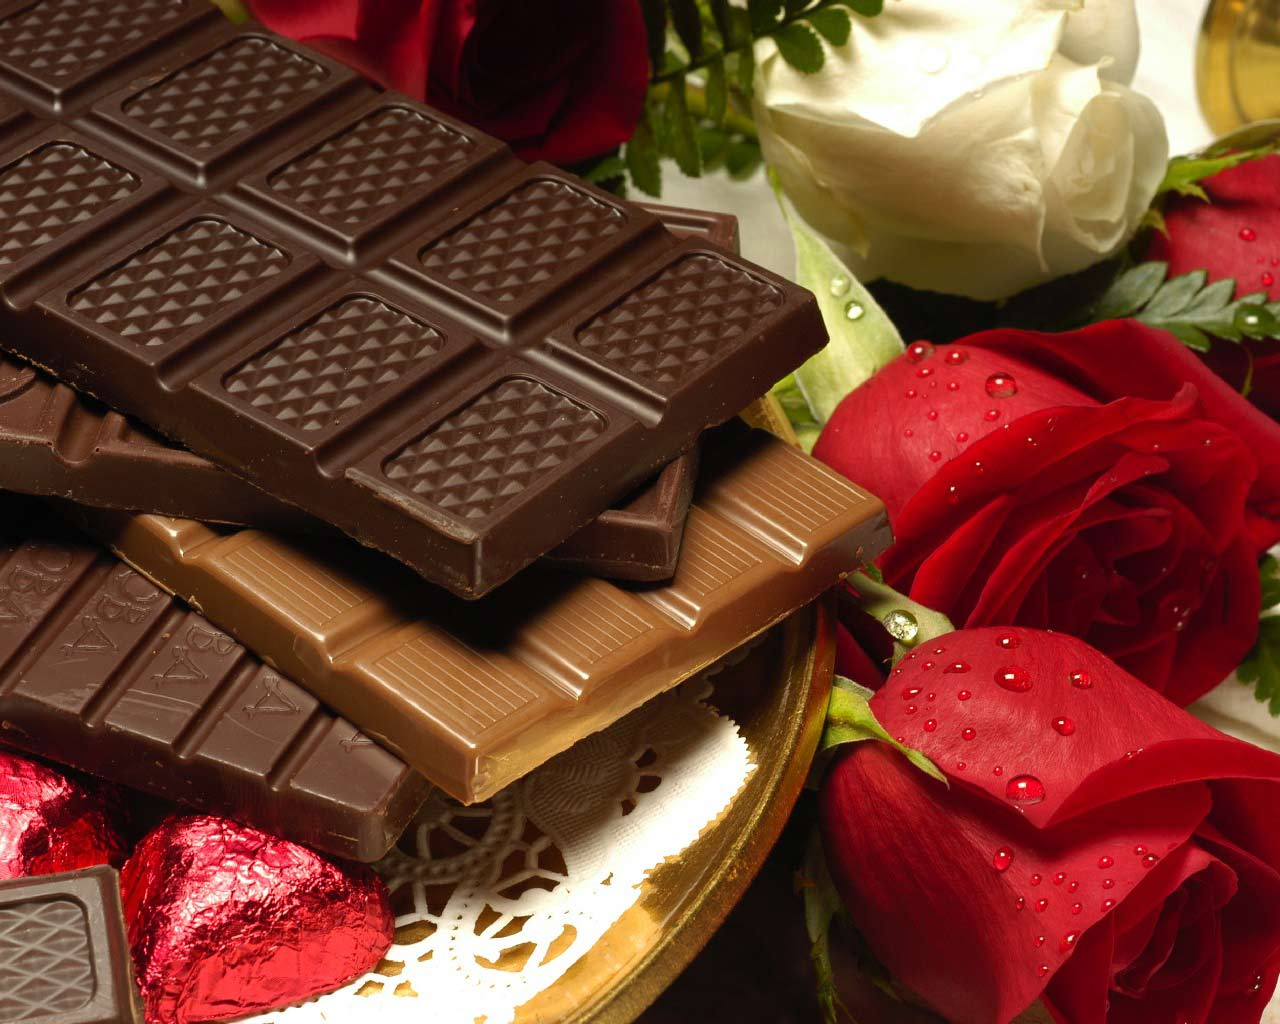 Chocolate Day SMS chocolate wallpaper chocolate scraps chocolate 1280x1024